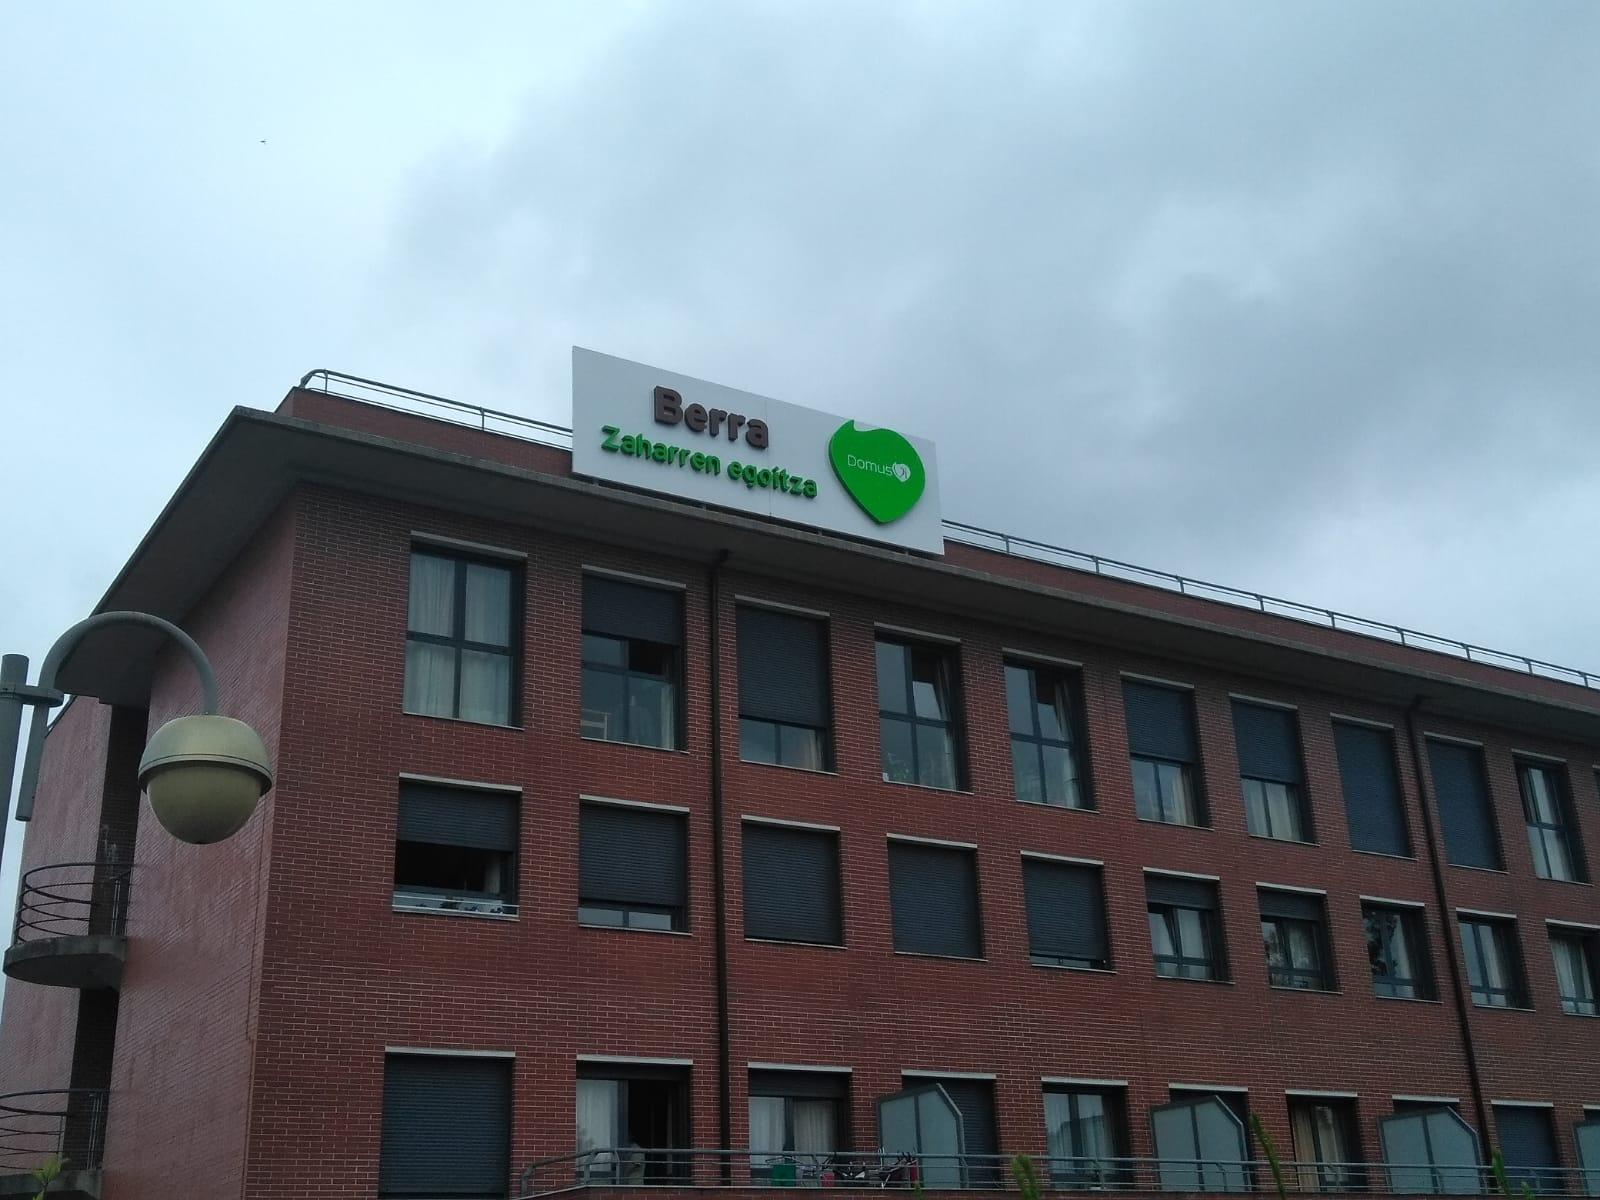 Residencia para mayores Berra, San Sebastián